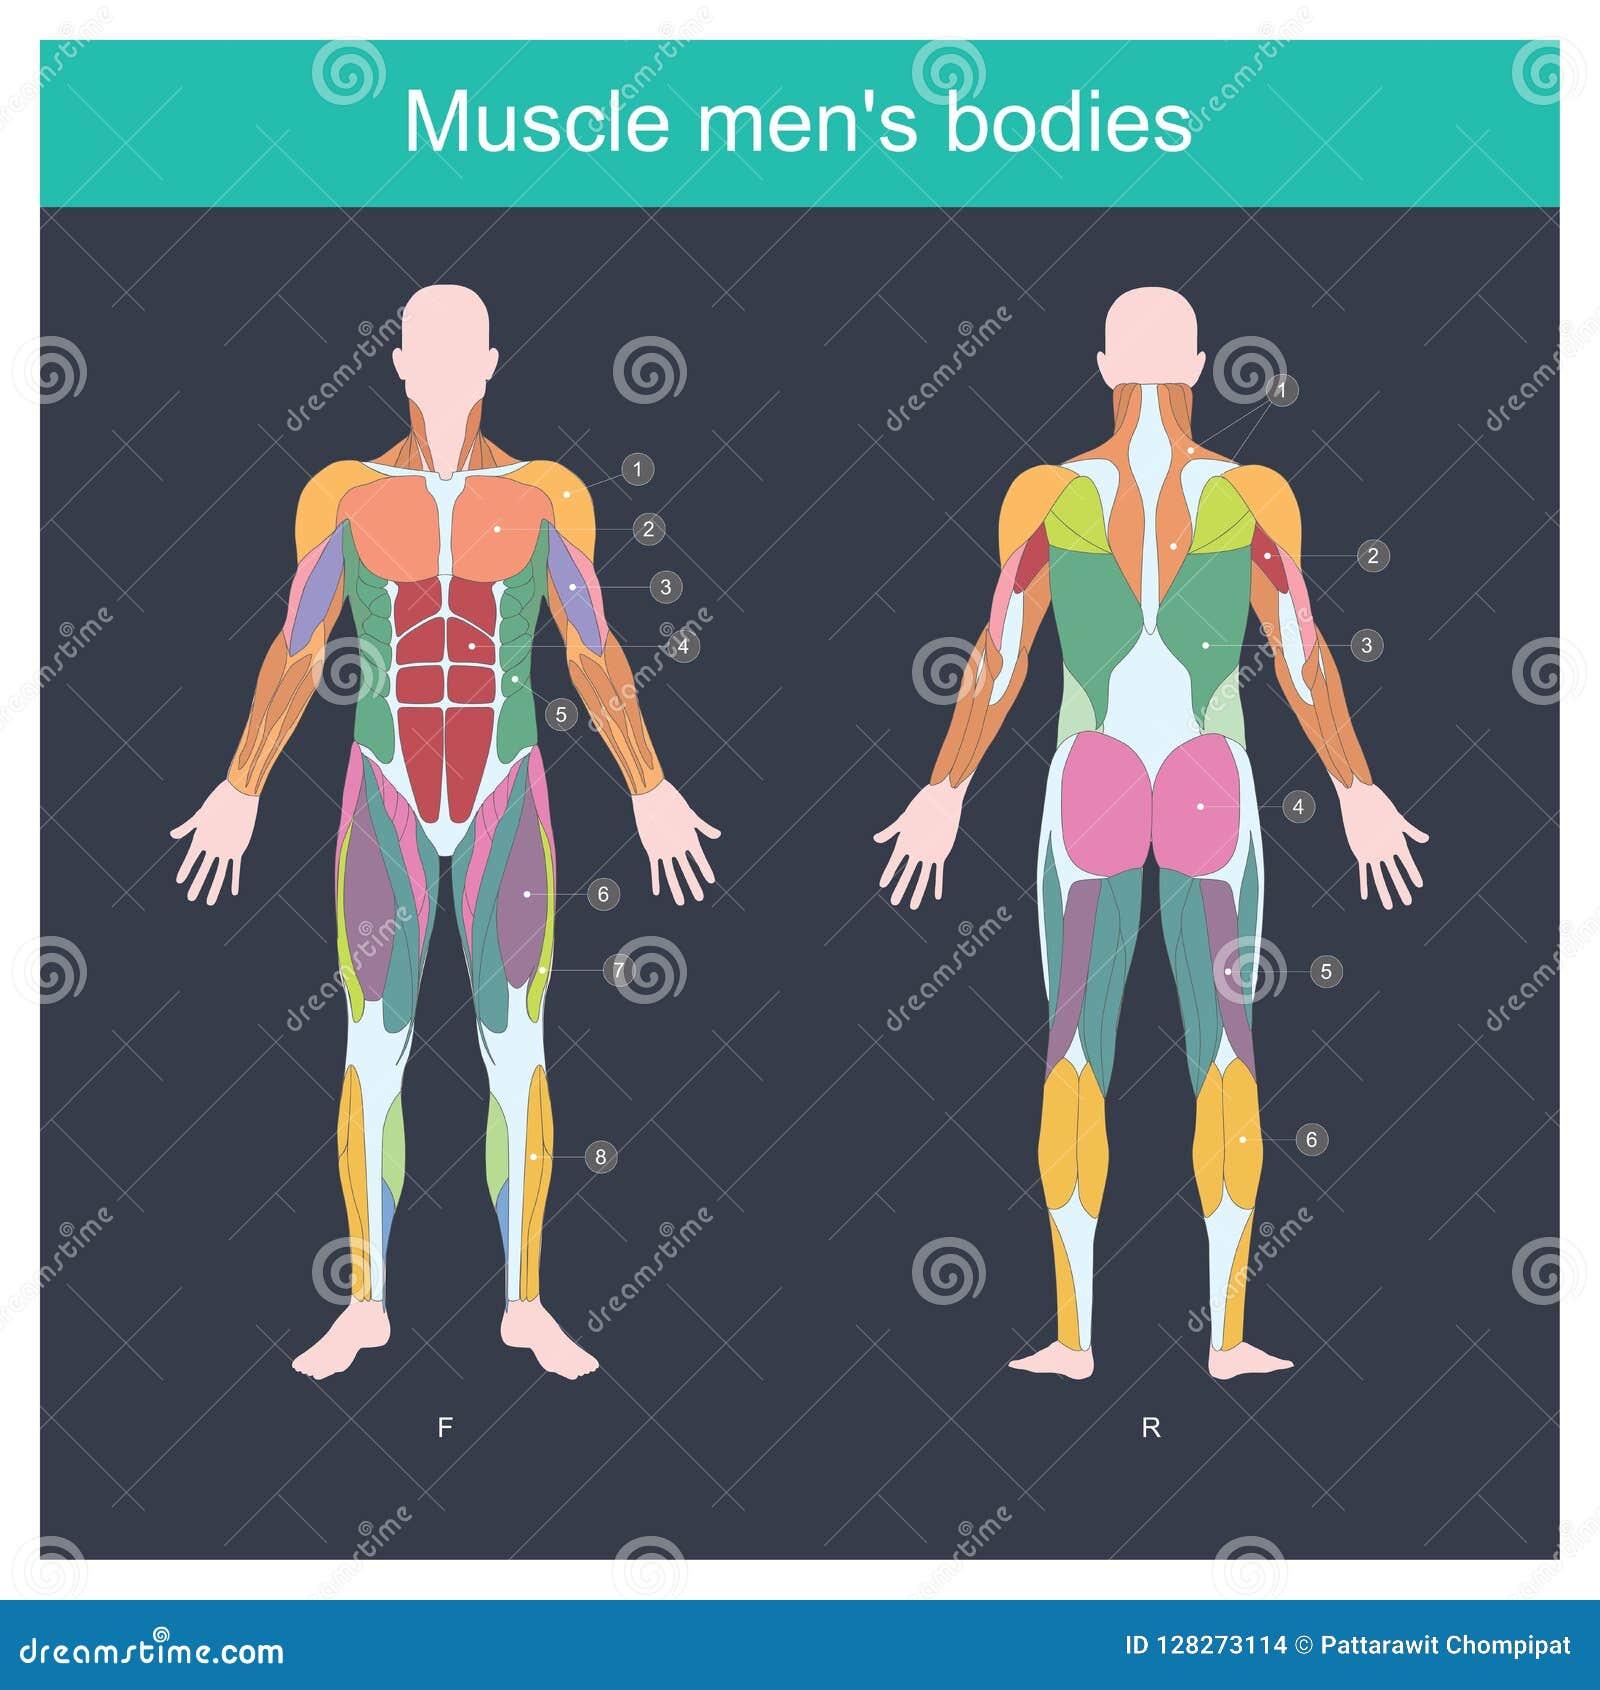 Muscle men bodies